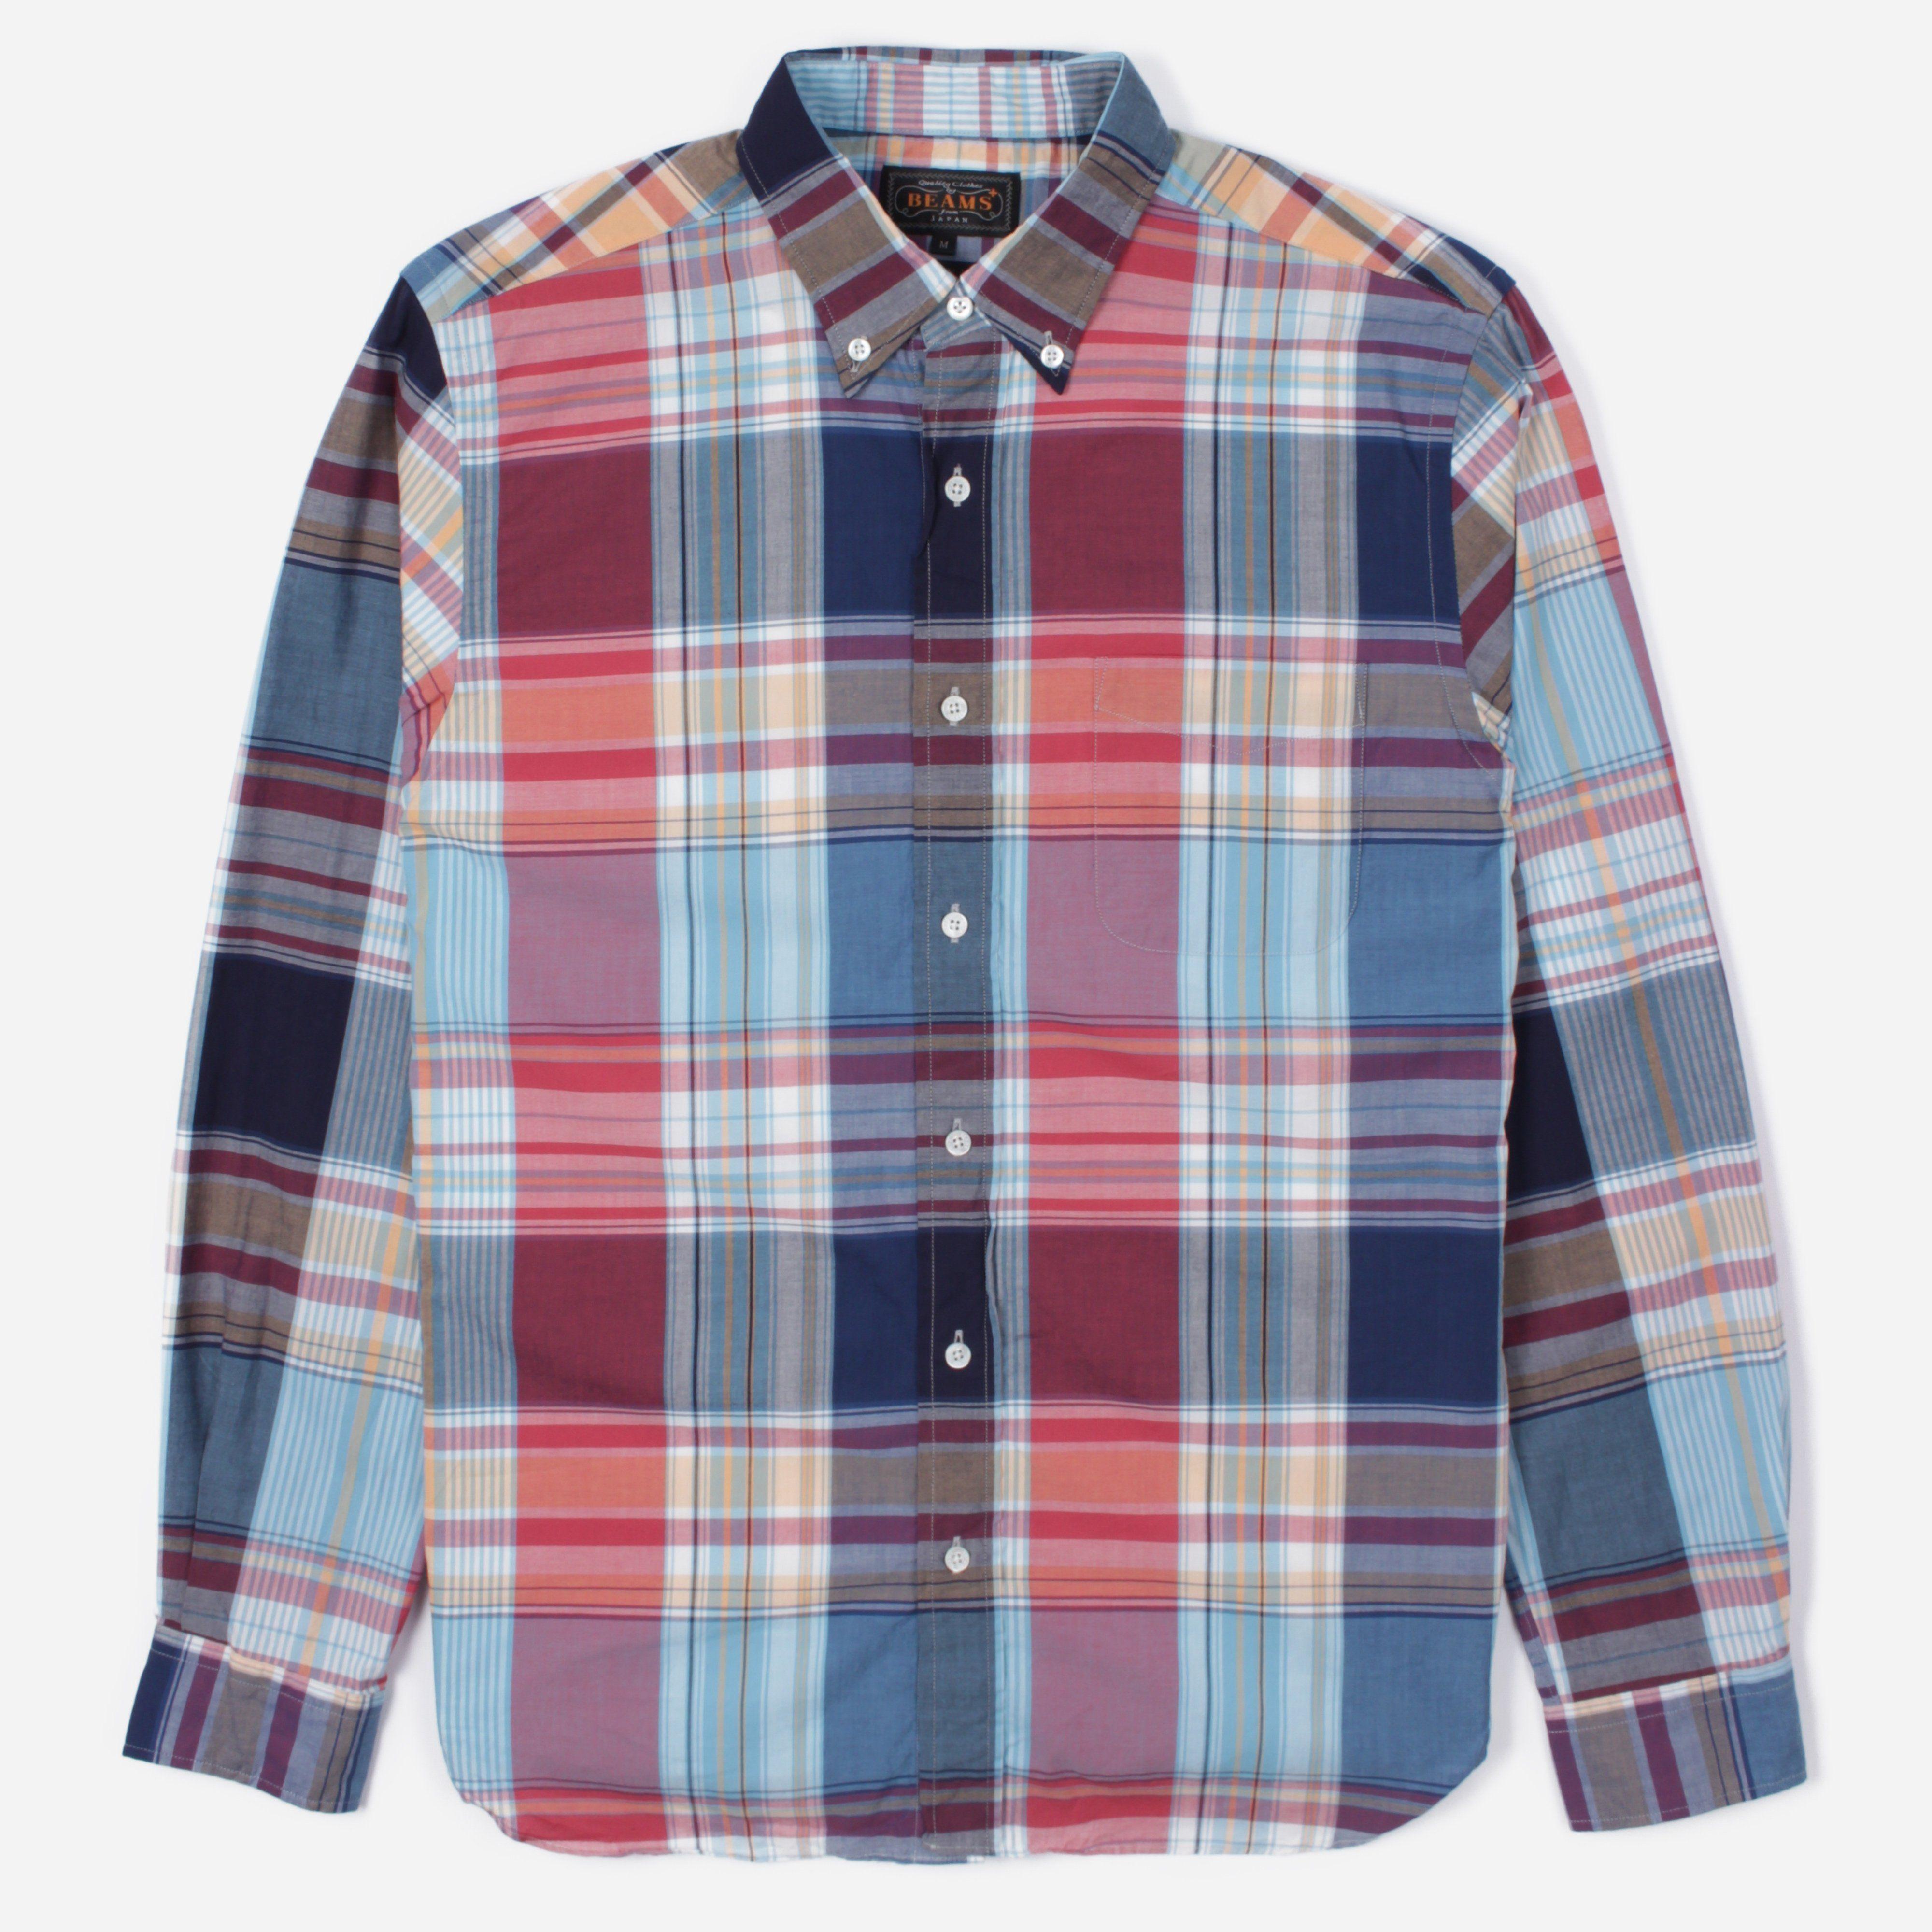 Beams Plus Big Check Long Sleeve Shirt